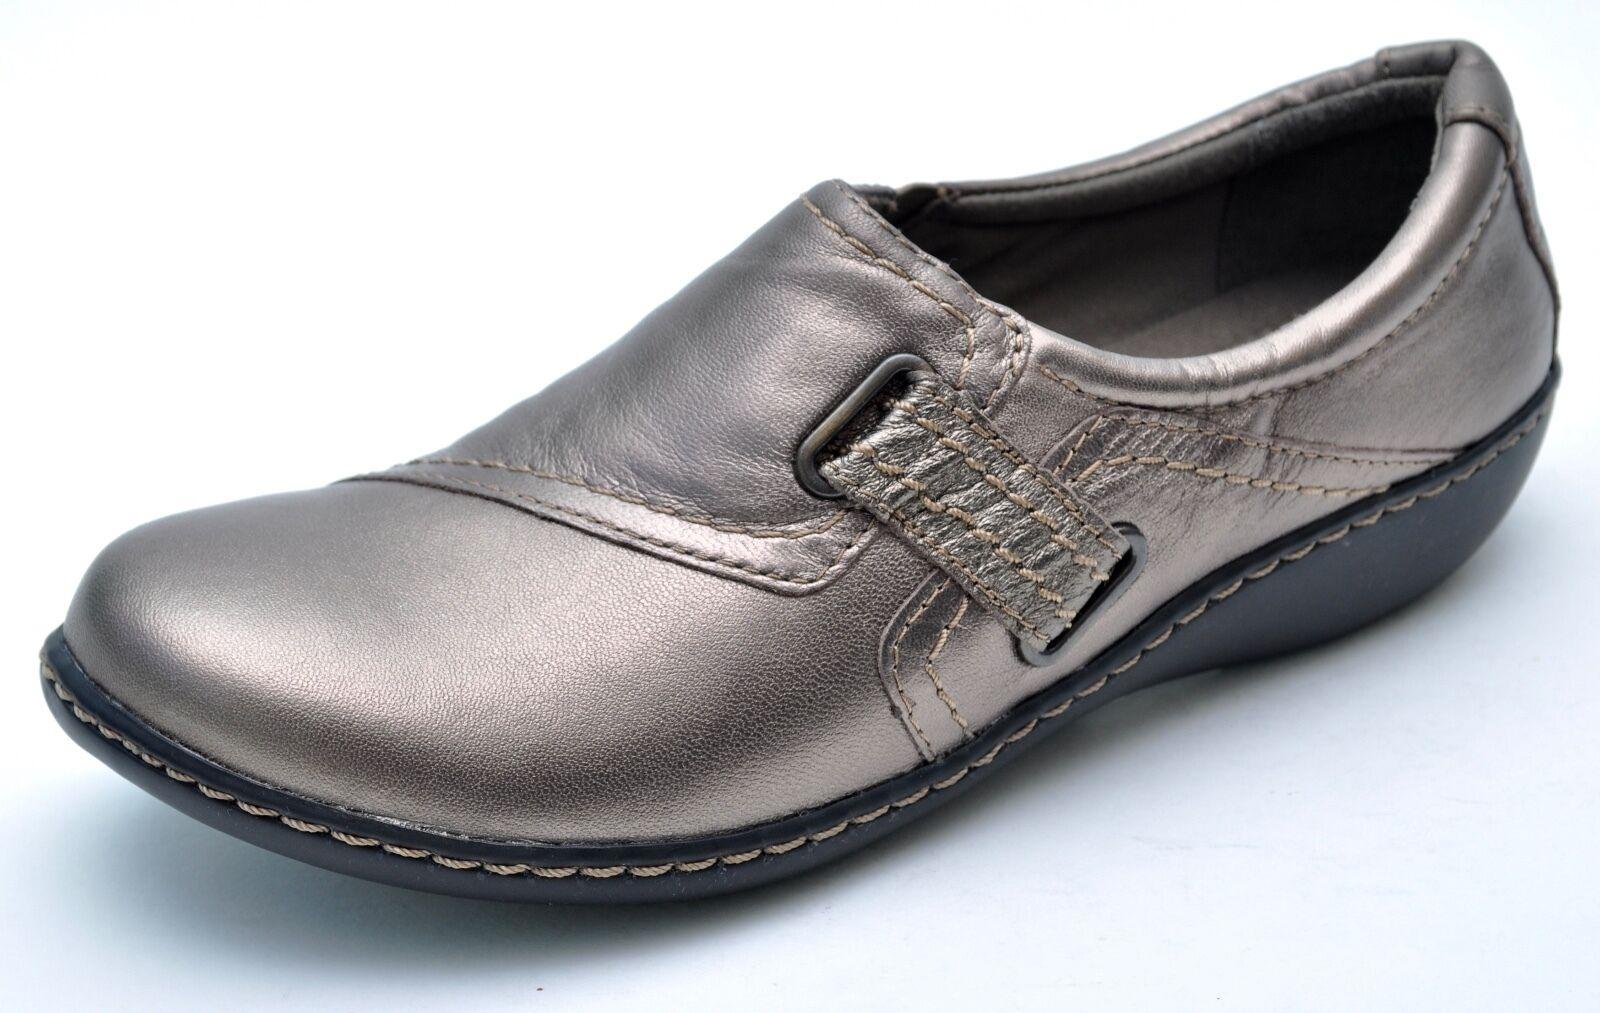 Clarks ASHLAND blueSH Pewter Metallic Leather Slip-Ons Women's 7.5 - NEW